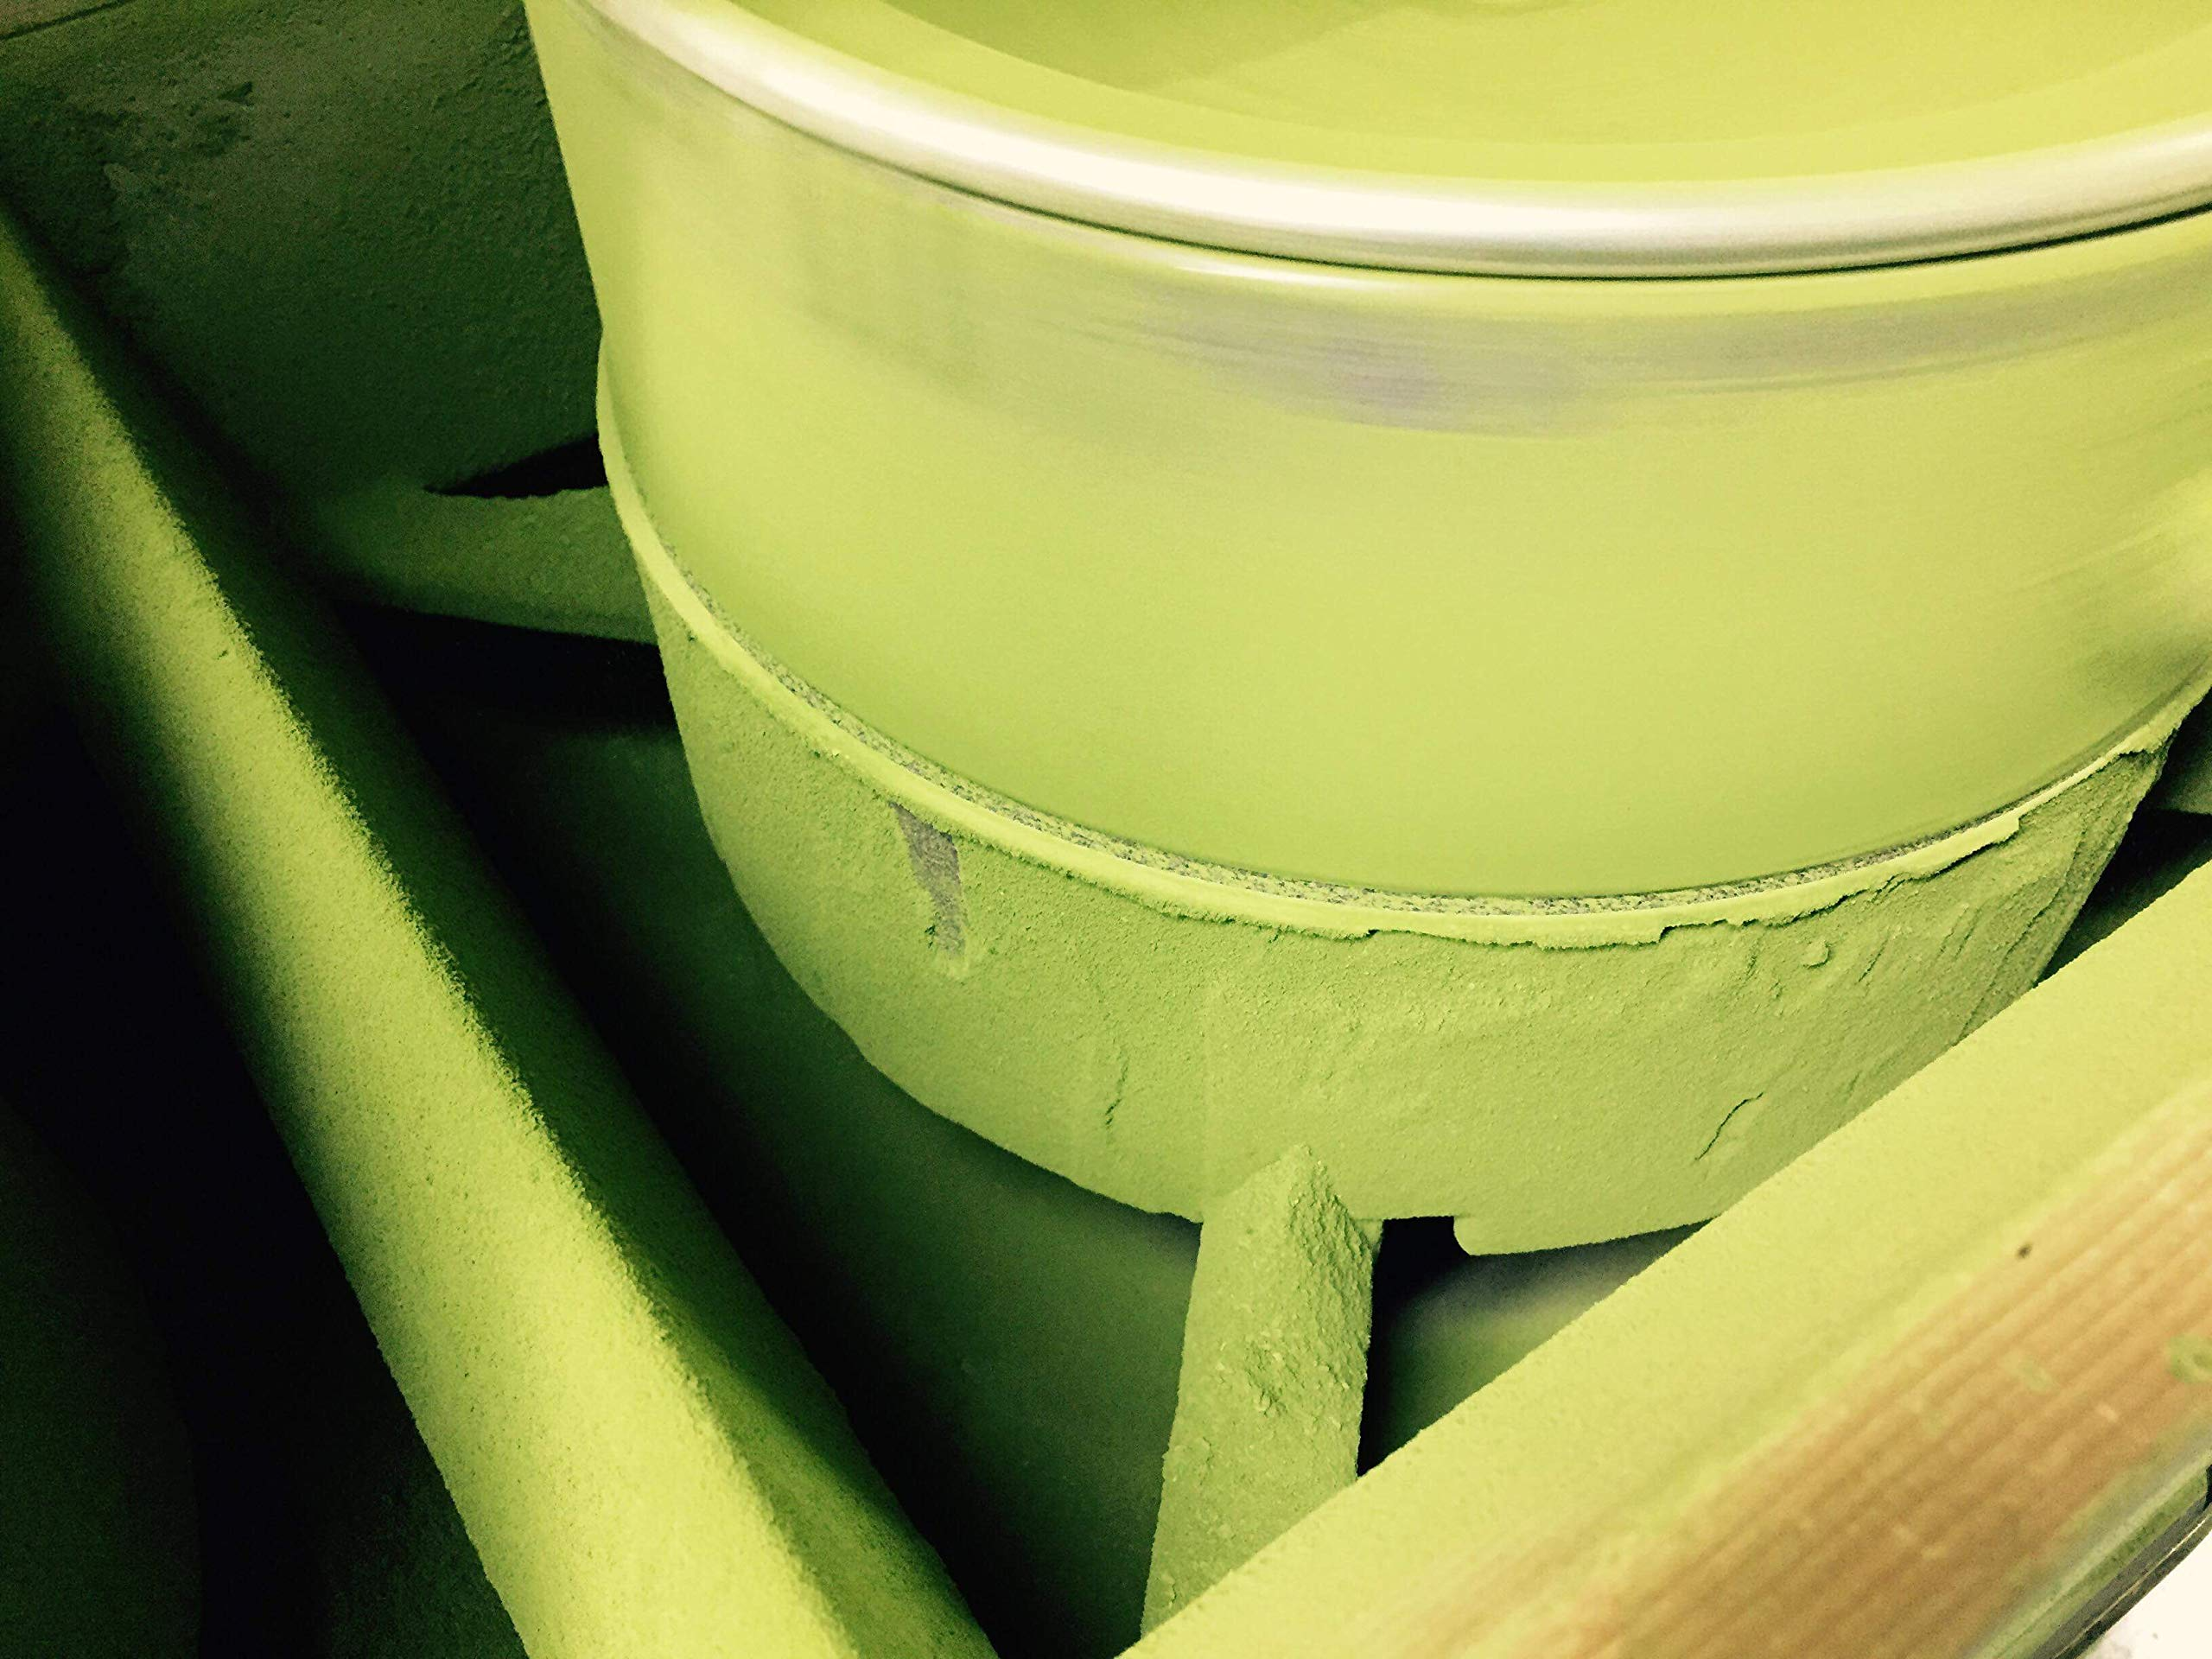 Nippon Cha - Samurai Matcha - Premium Green Tea Powder - Japanese Origin - First Harvest - Radiation Free - Zero Sugar - Ceremonial Grade for Everyday Recipes, 30g (1oz) Tin